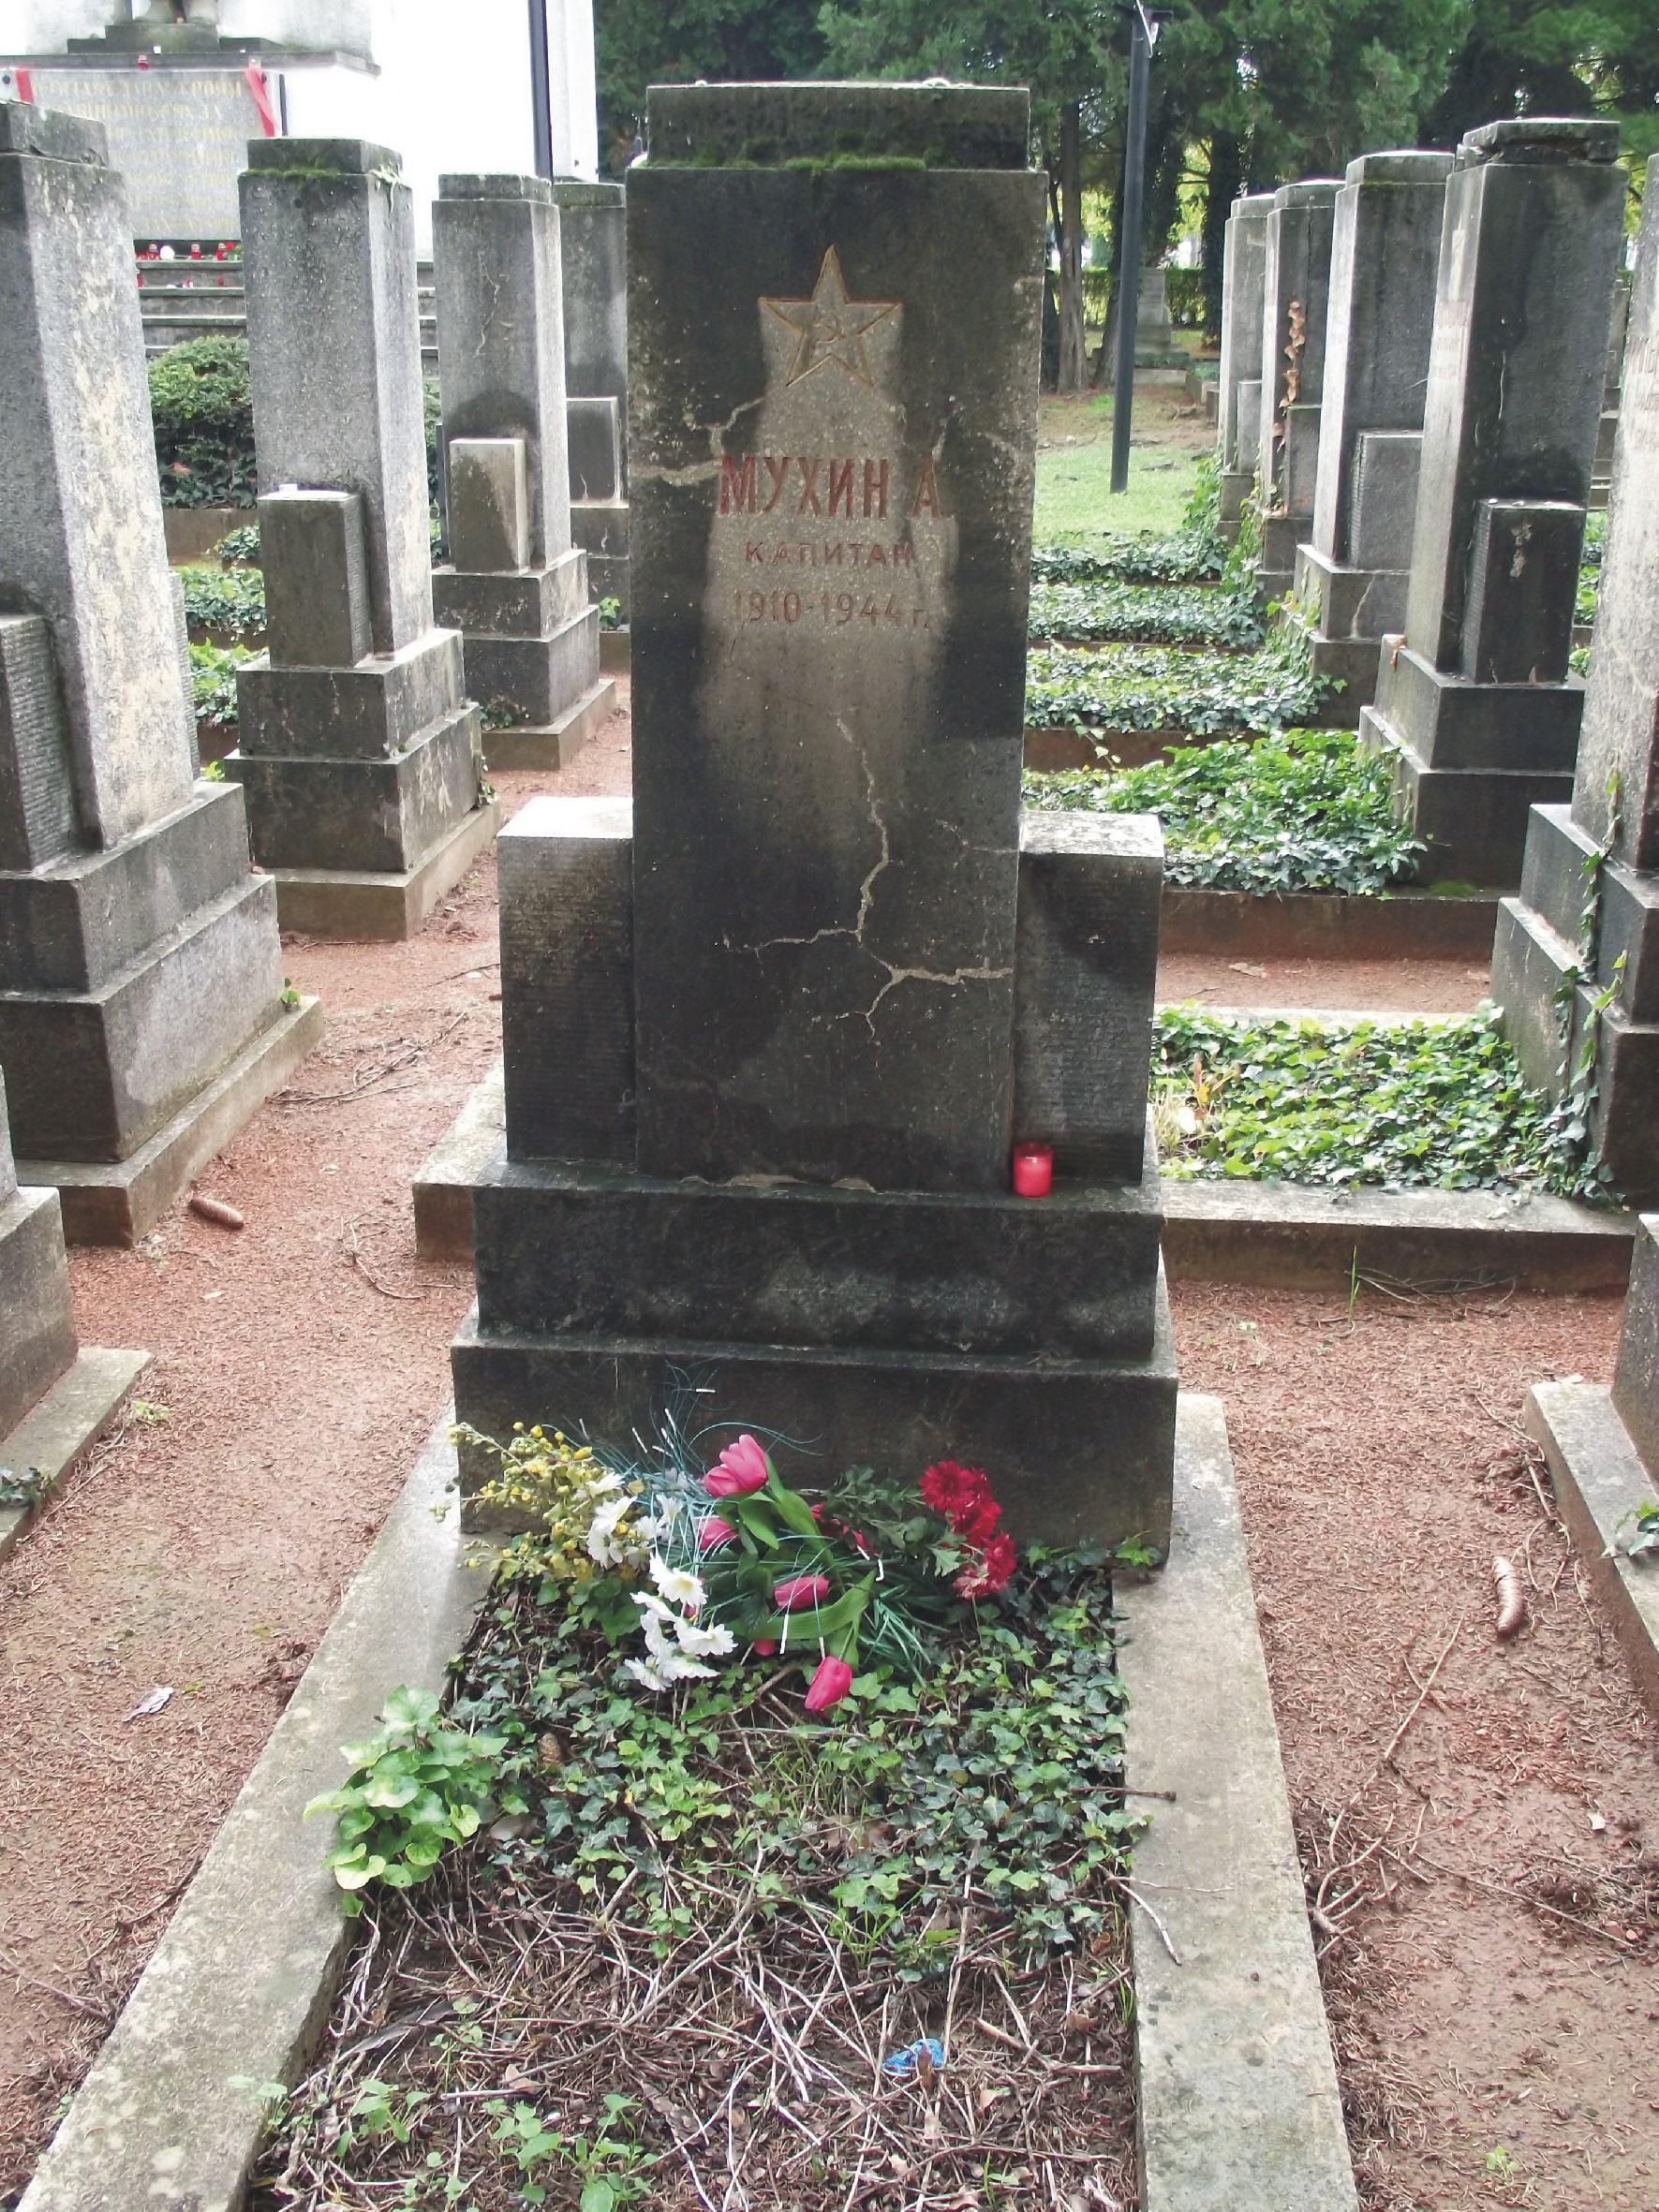 Grave_2.jpg.0748368ee0921d41c0b8e03f6b87ab56.jpg